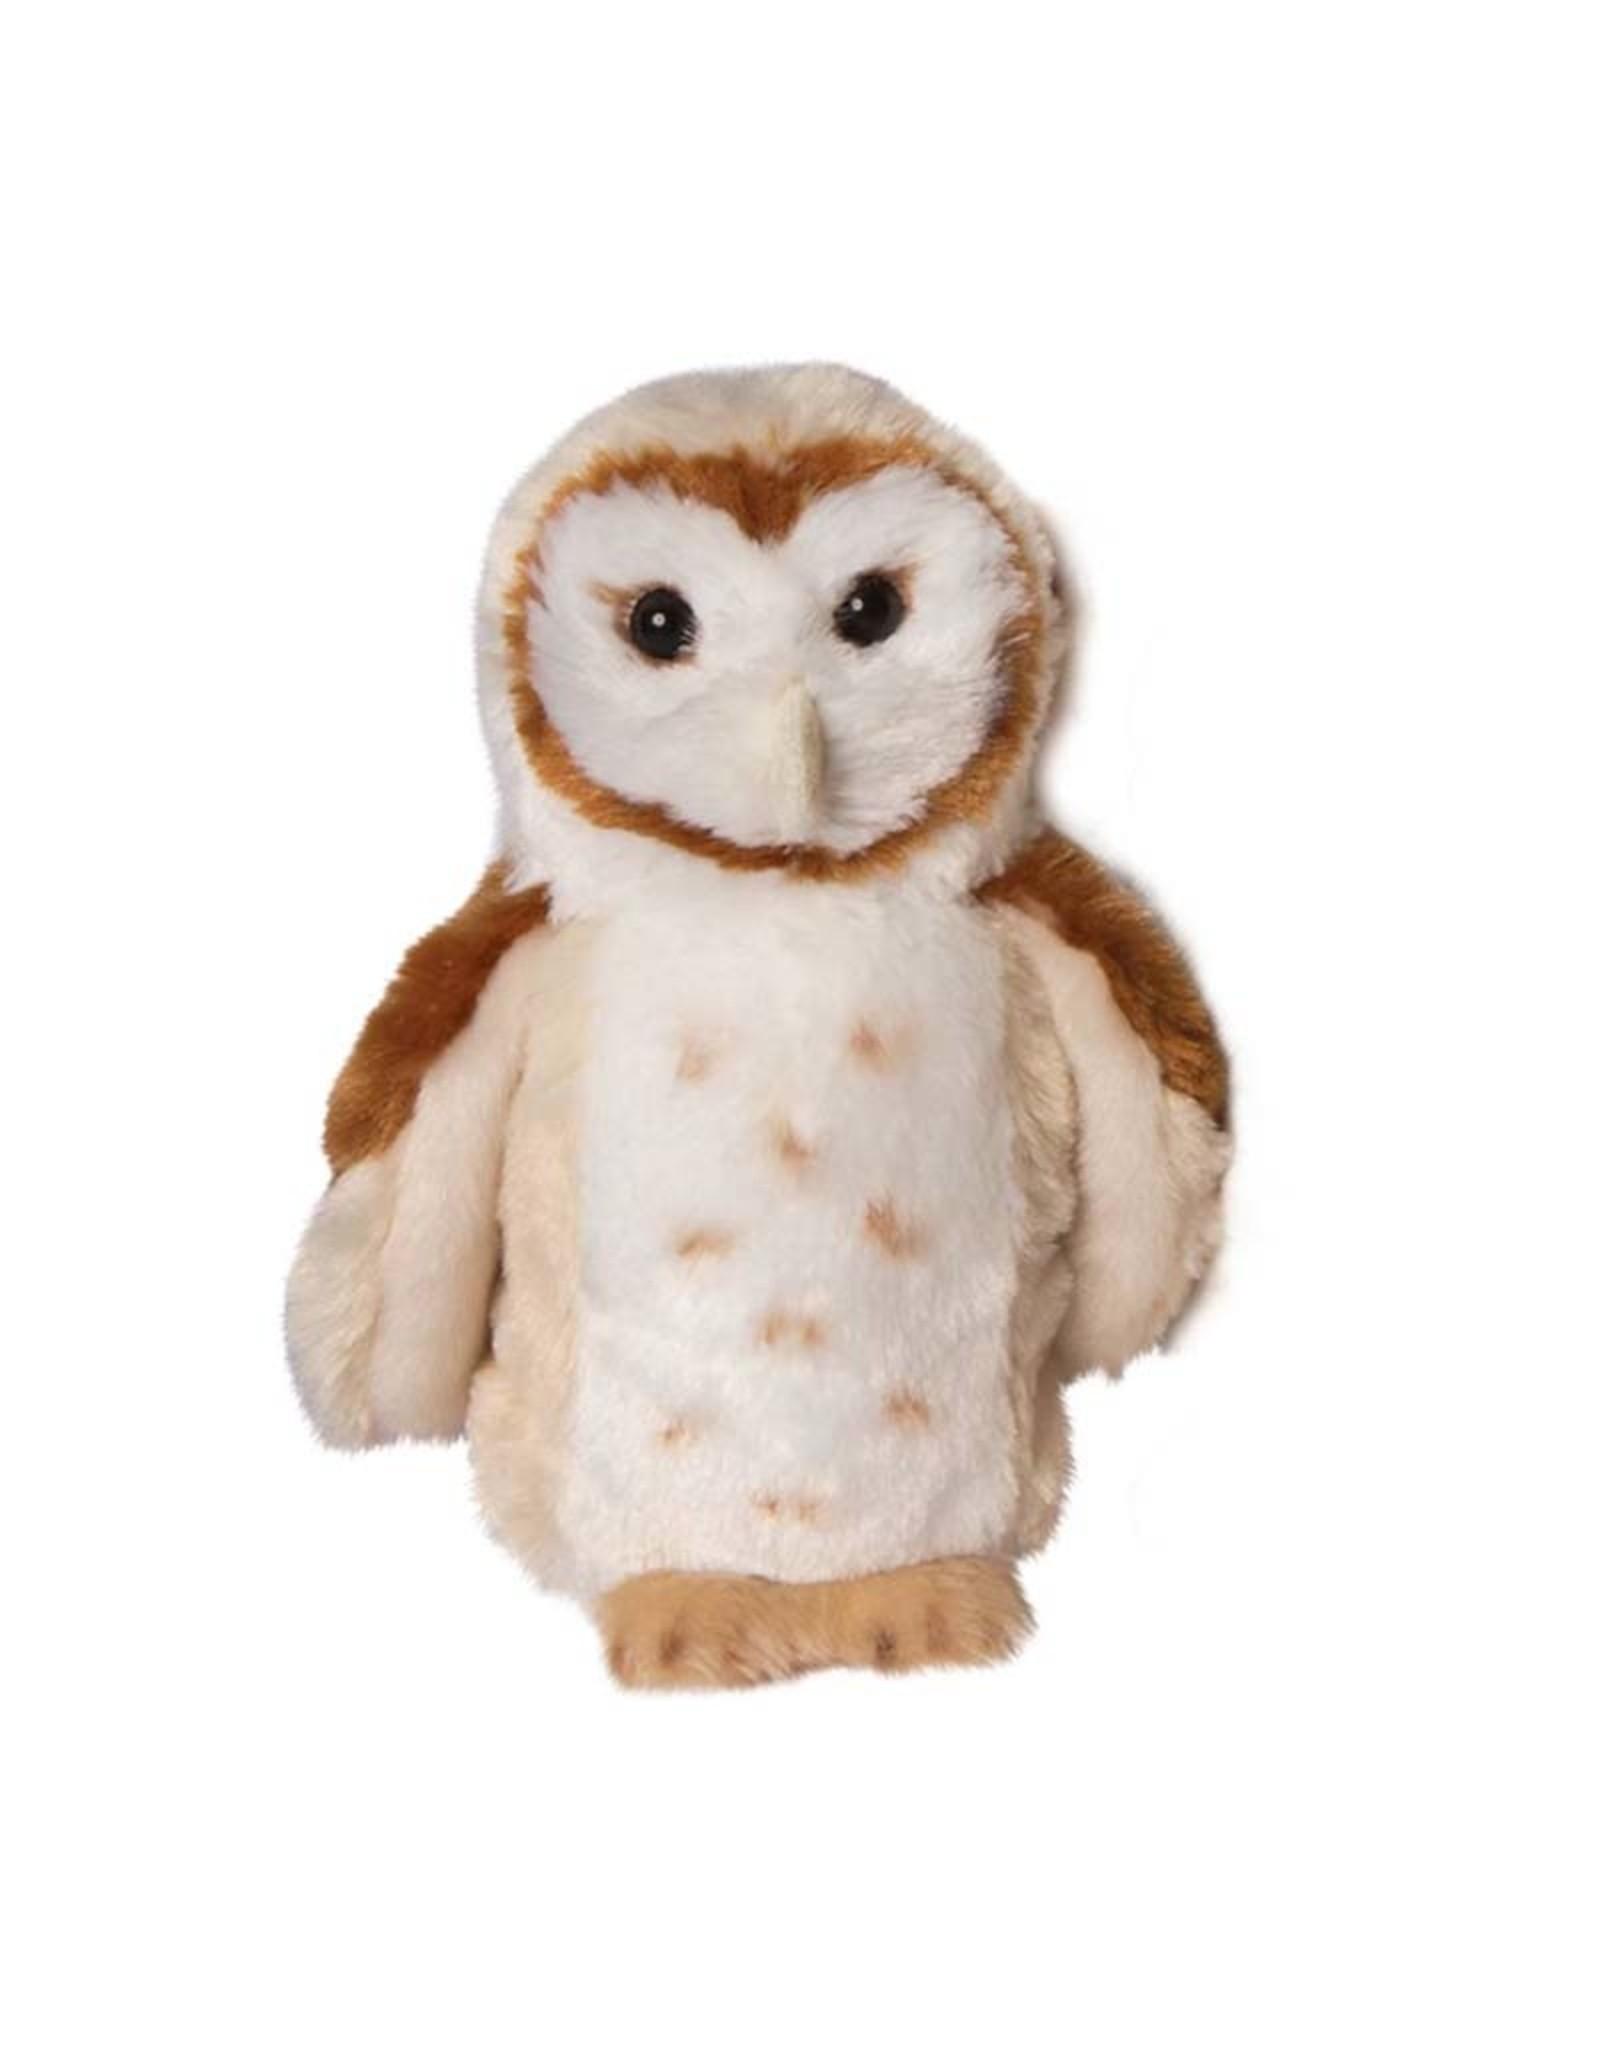 Douglas RAFTER BARN OWL